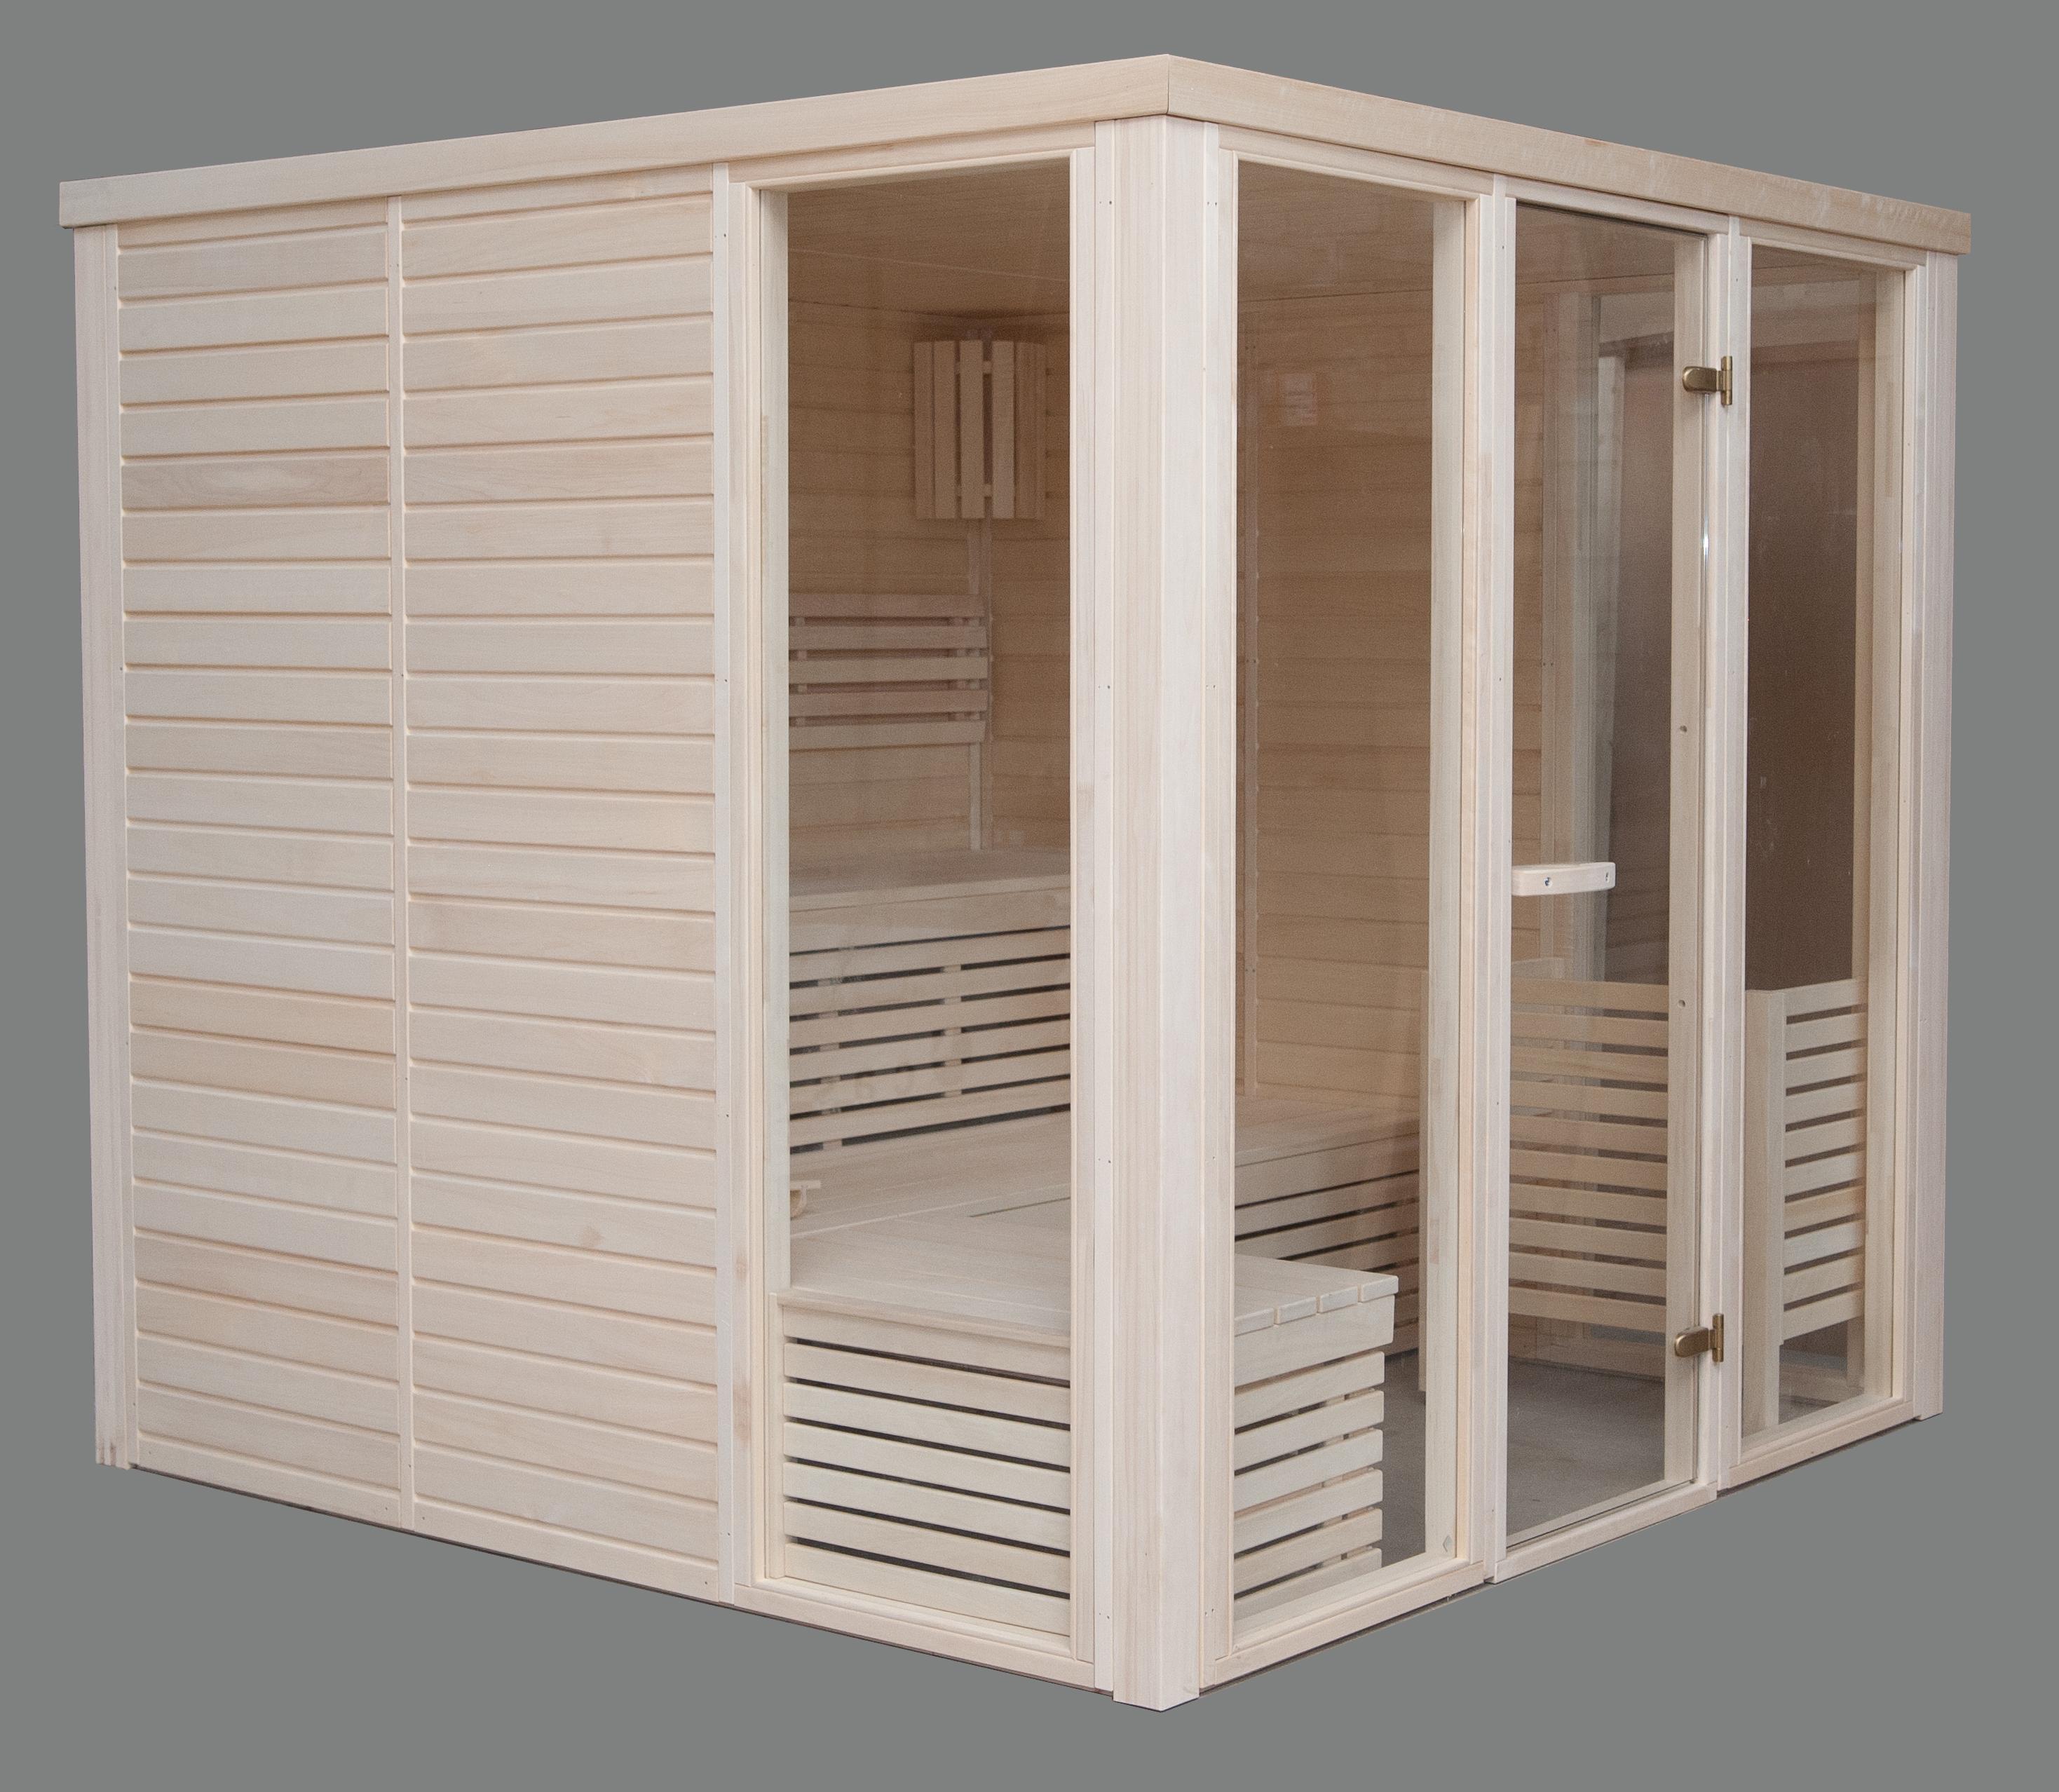 Sauna Prefabbricata Legno Prezioso Latifoglie L'Aspen  2.20 X 2.20 Prezzo 2992 €*